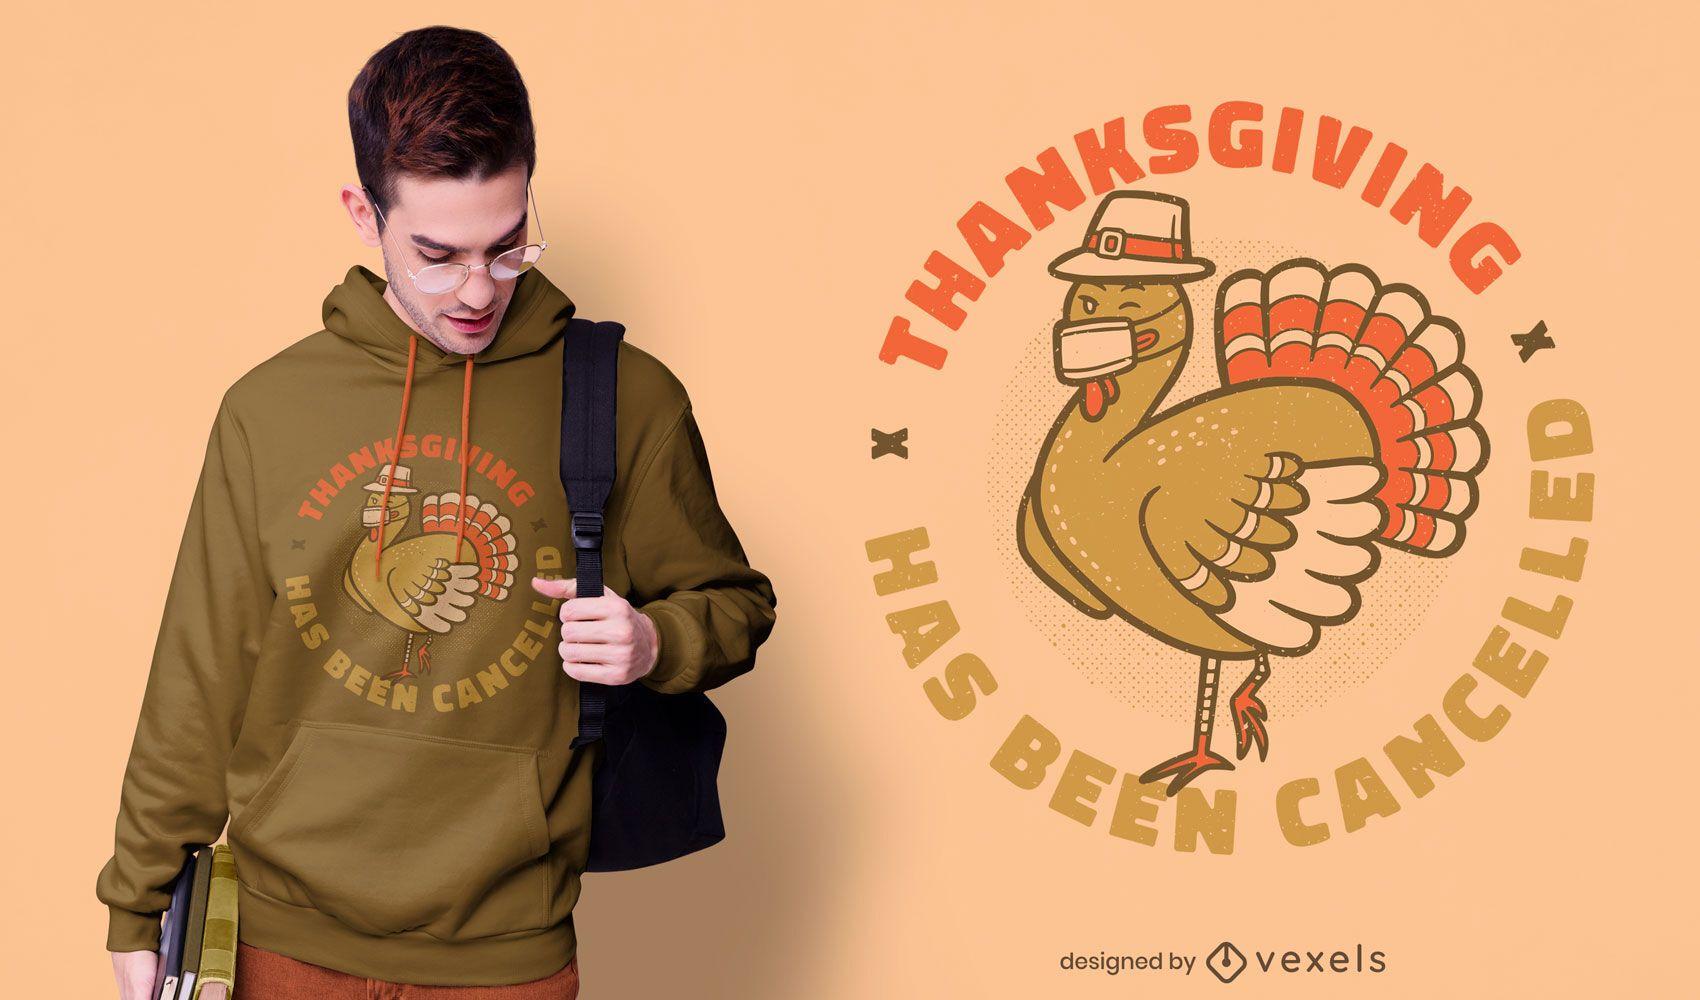 Cancelled thanksgiving t-shirt design